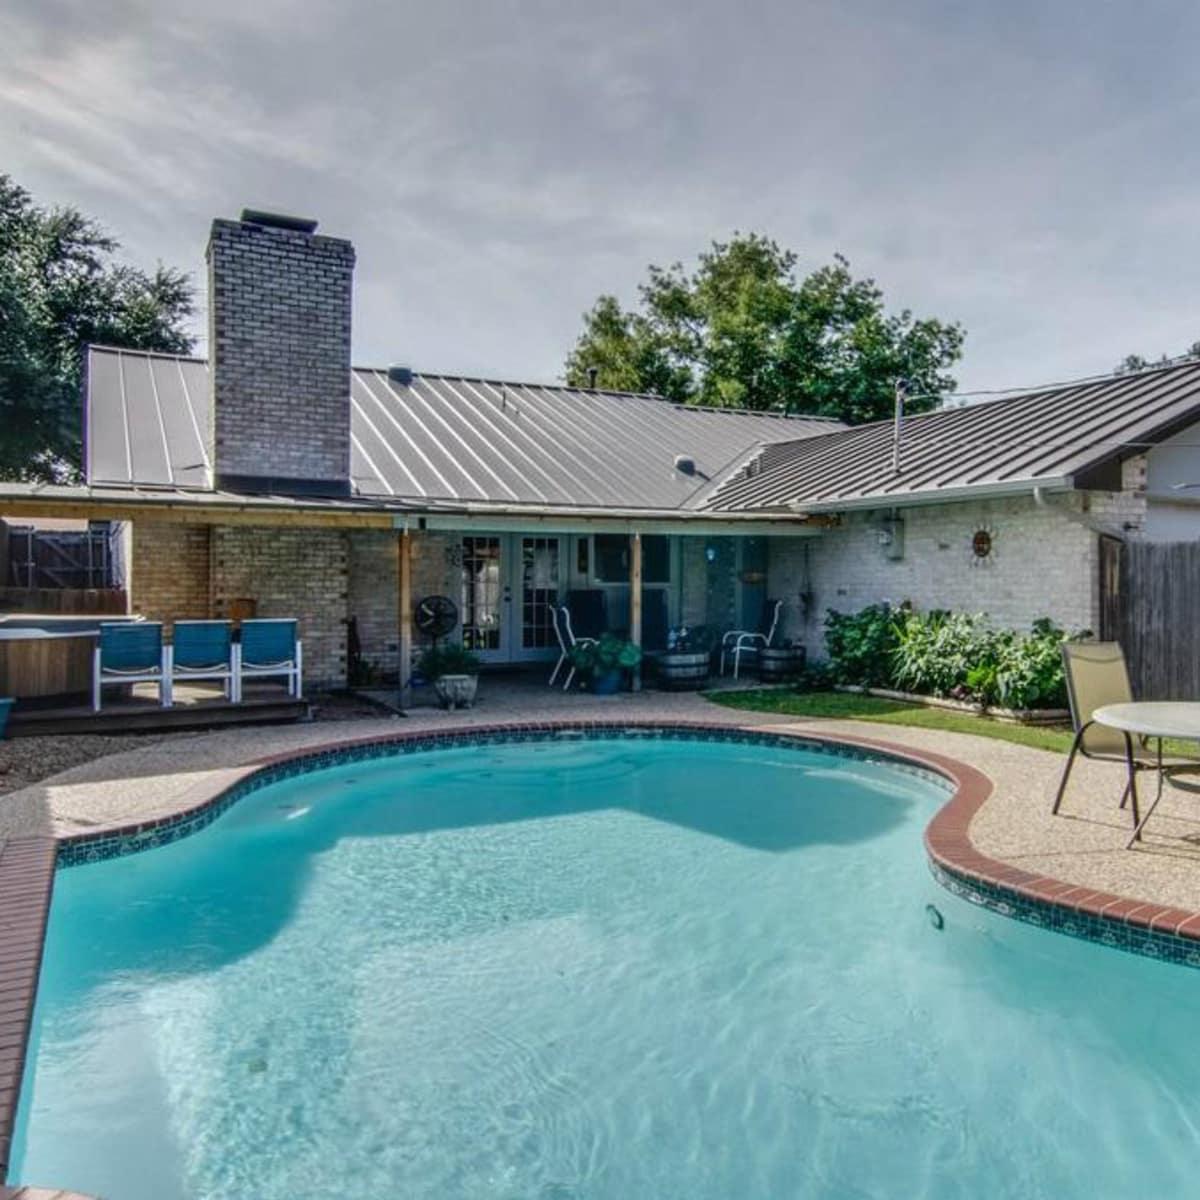 3065 Kinkaid Dr. pool in Dallas